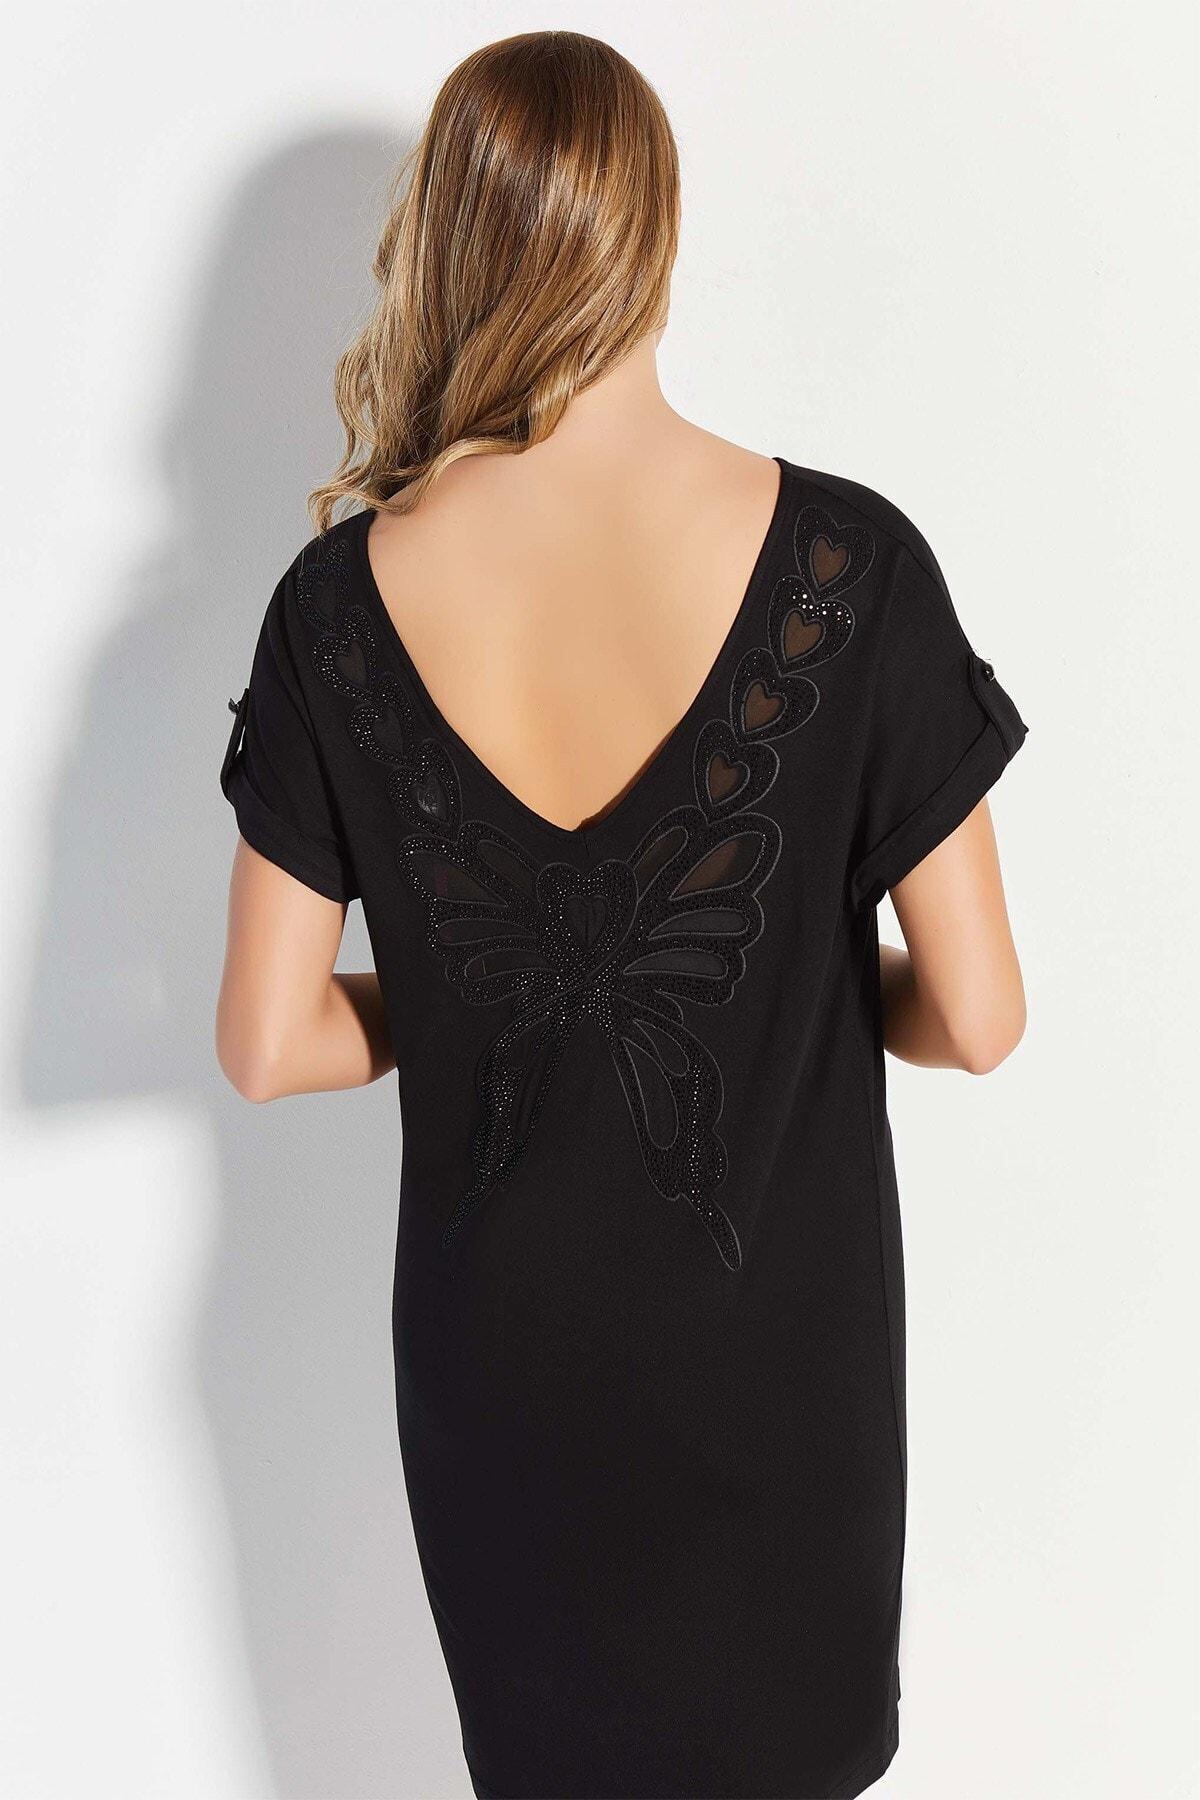 Lohusa Sepeti 20770 Siyah Geniş Yaka Sırt Detaylı Elbise 2